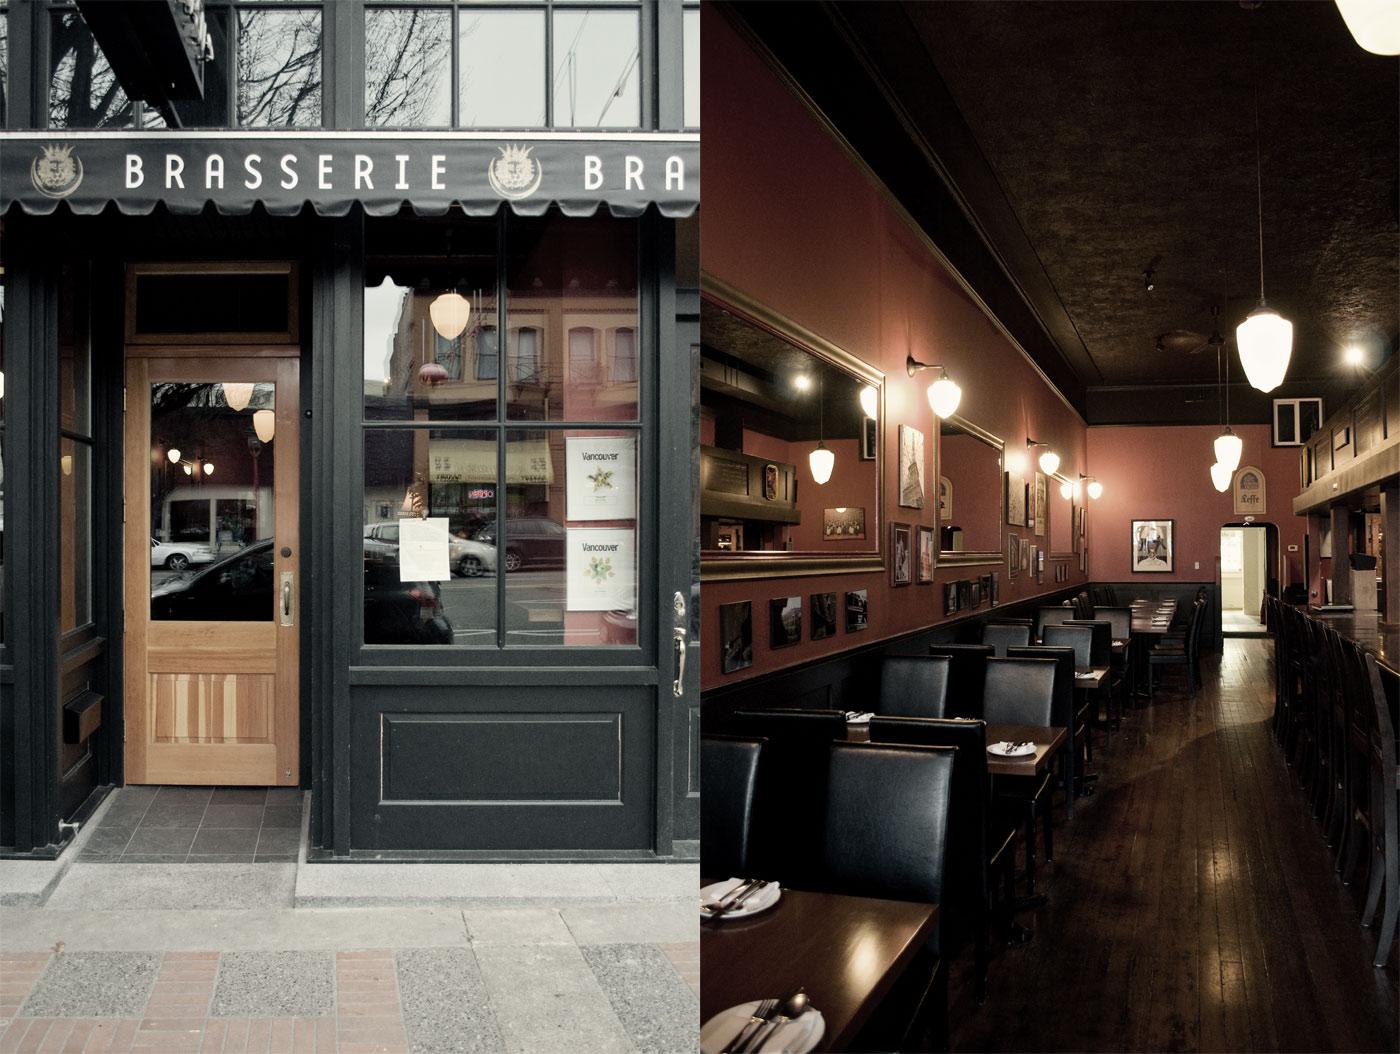 Brasserie L'Ecole餐厅